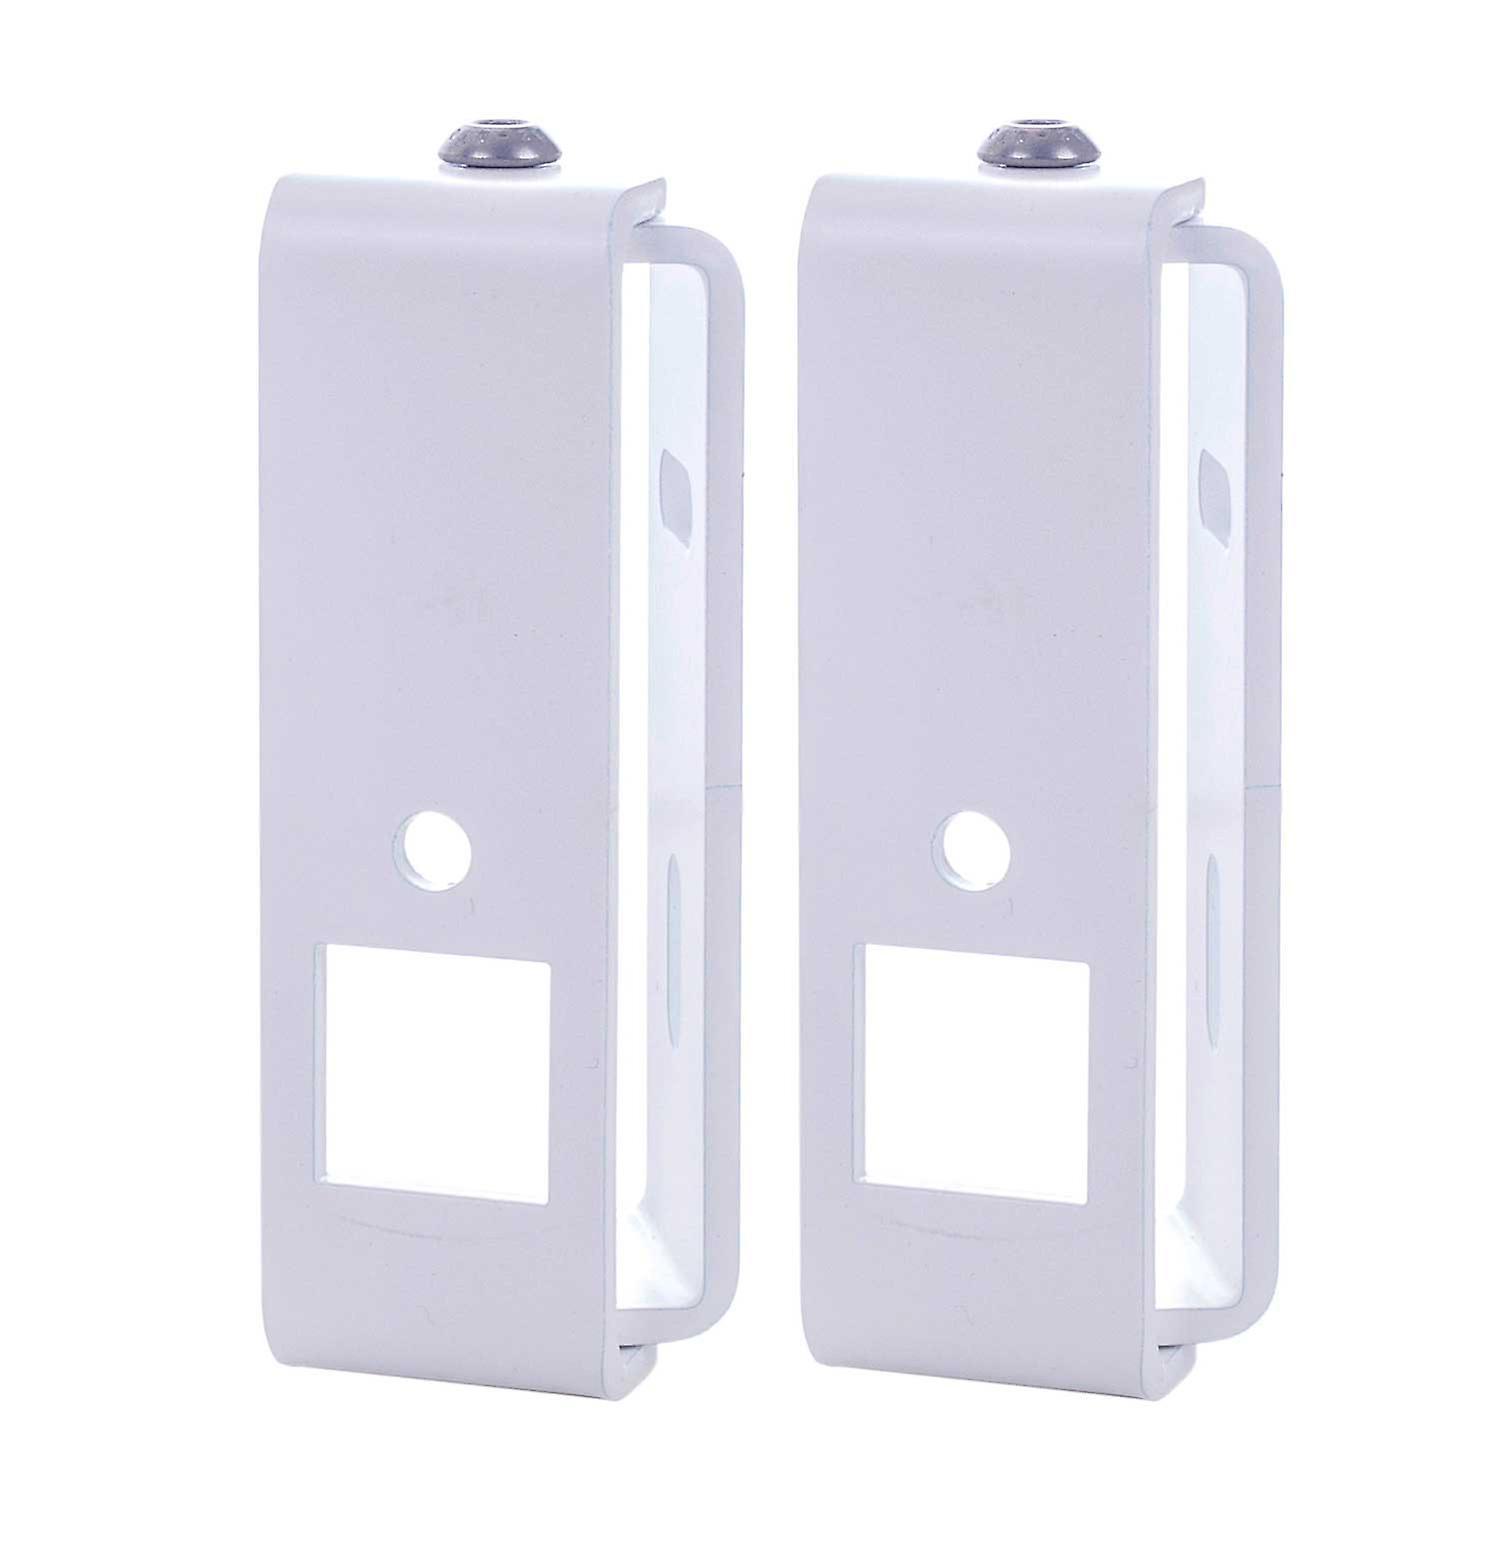 Vebos wall mount Sonos Play 1 white set